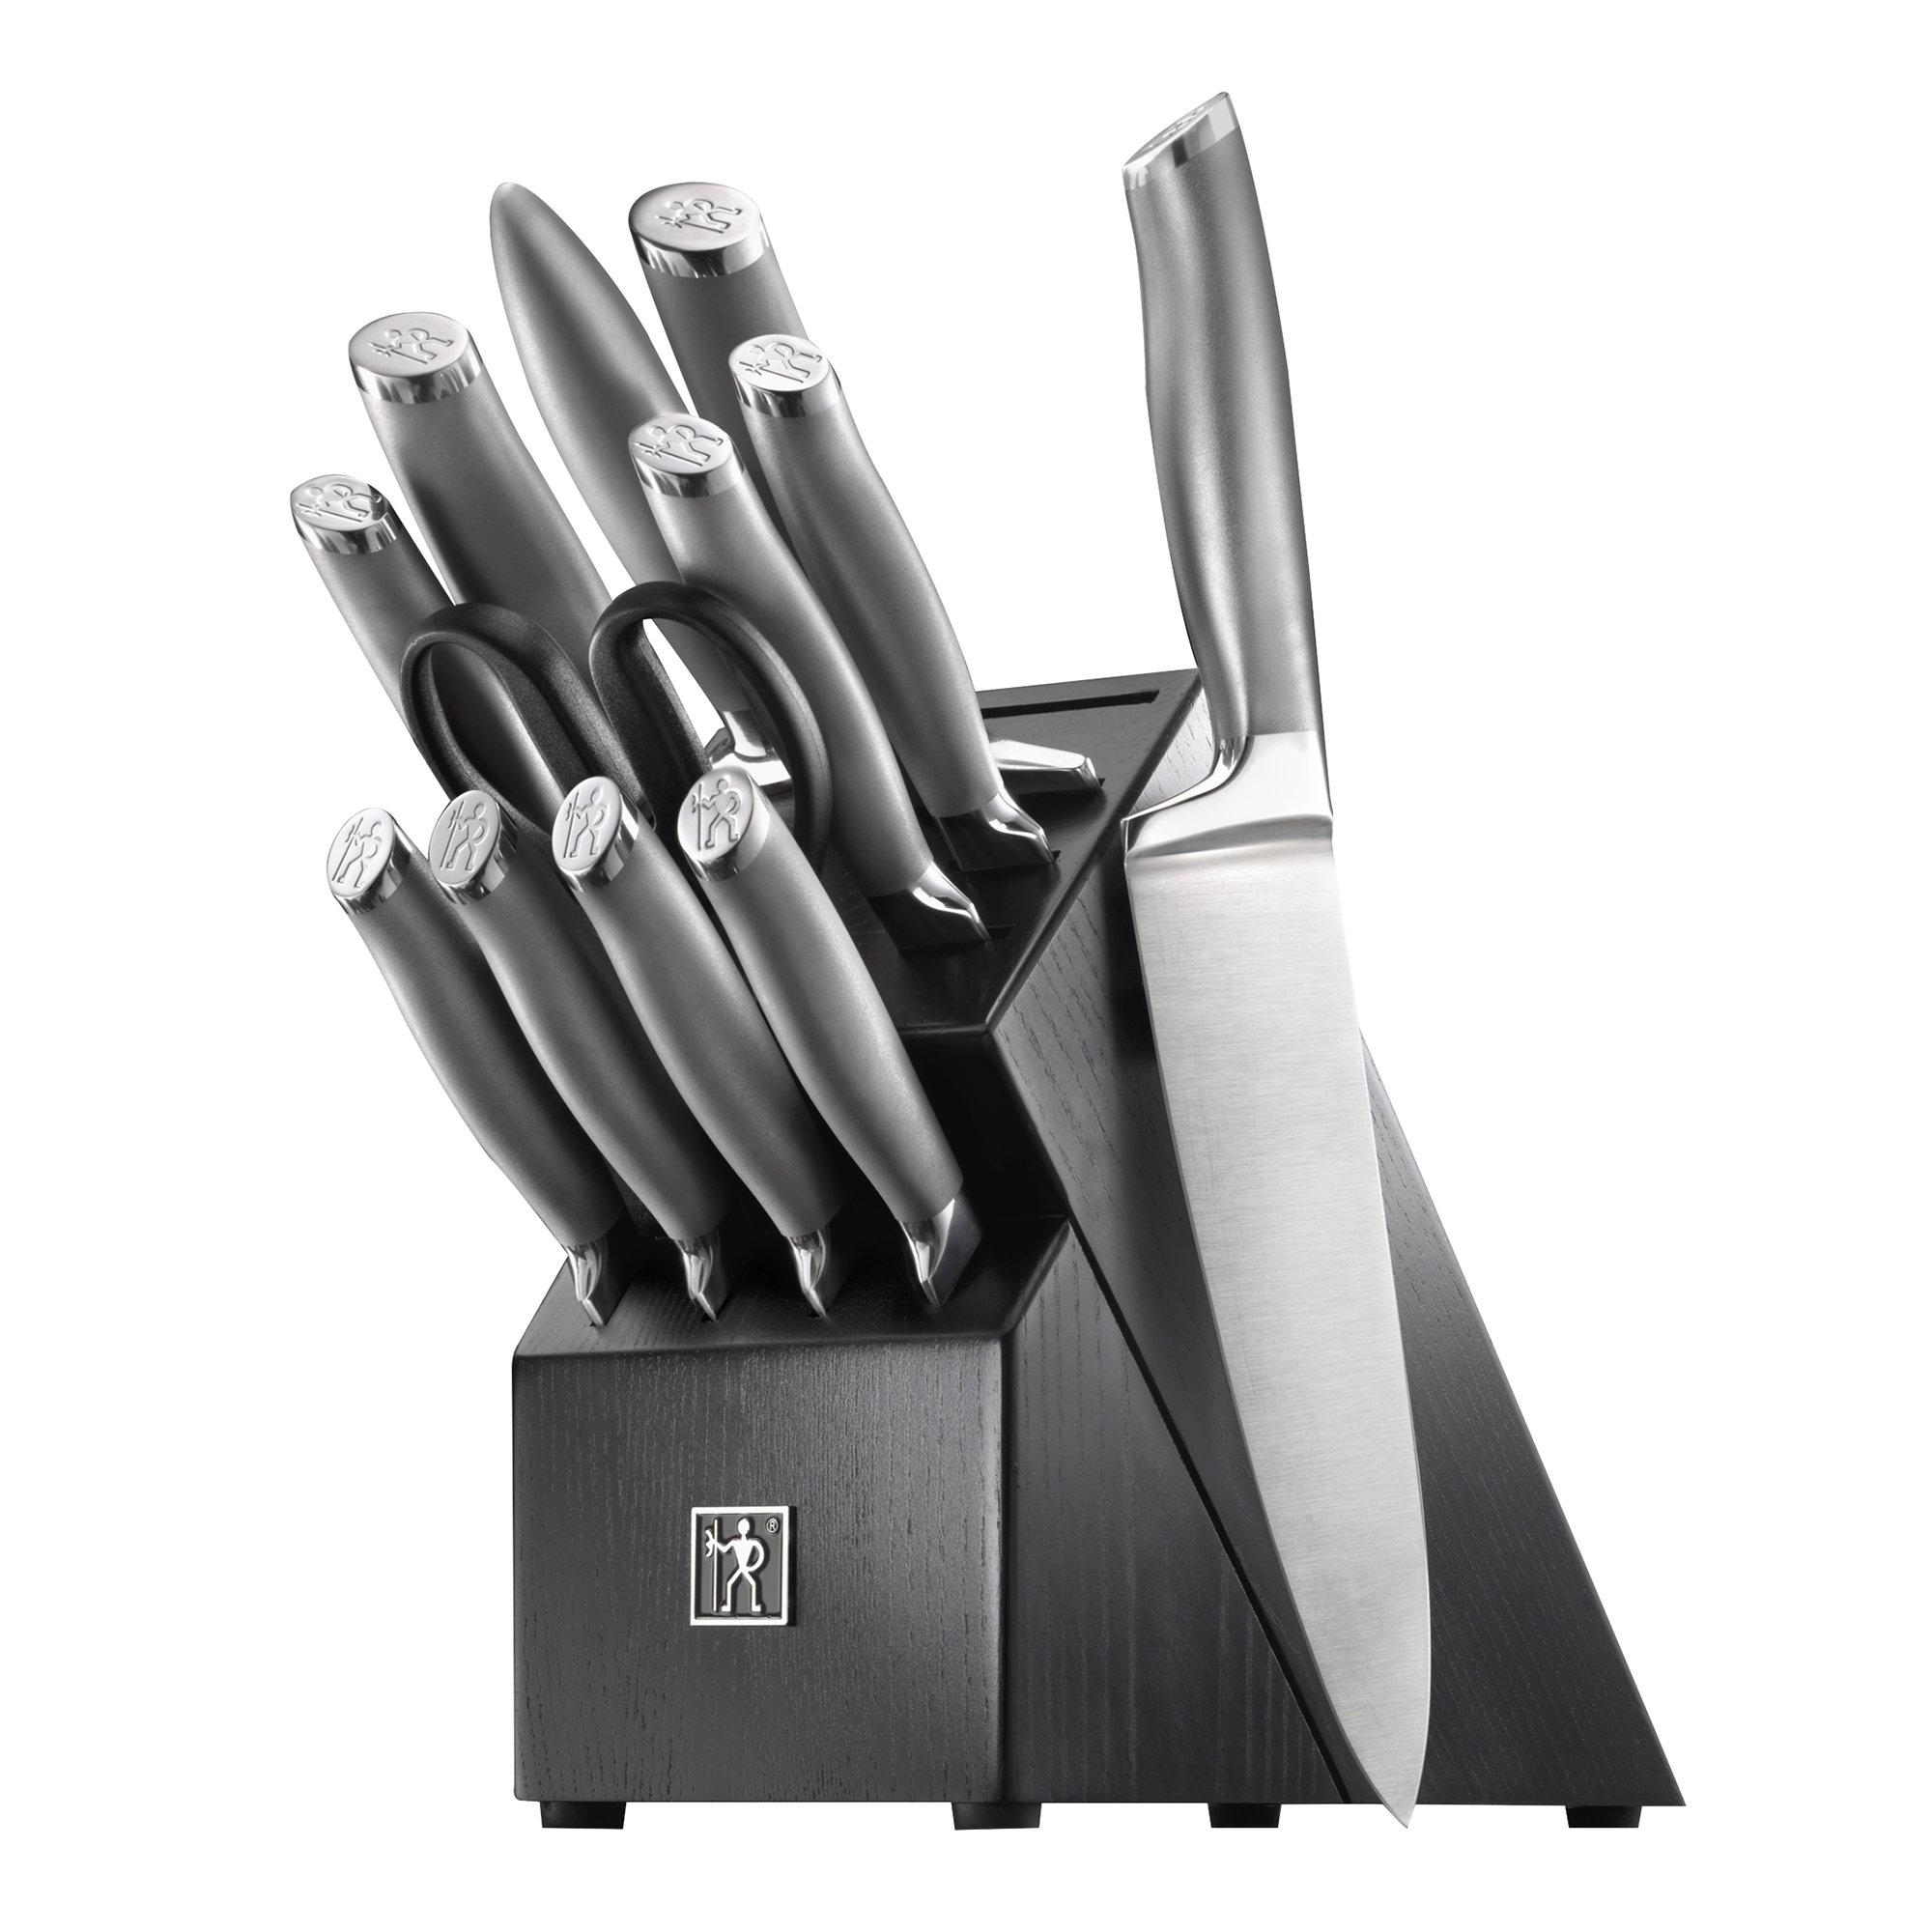 J.A. Henckels International Modernist 13-pc Knife Block Set by ZWILLING J.A. Henckels